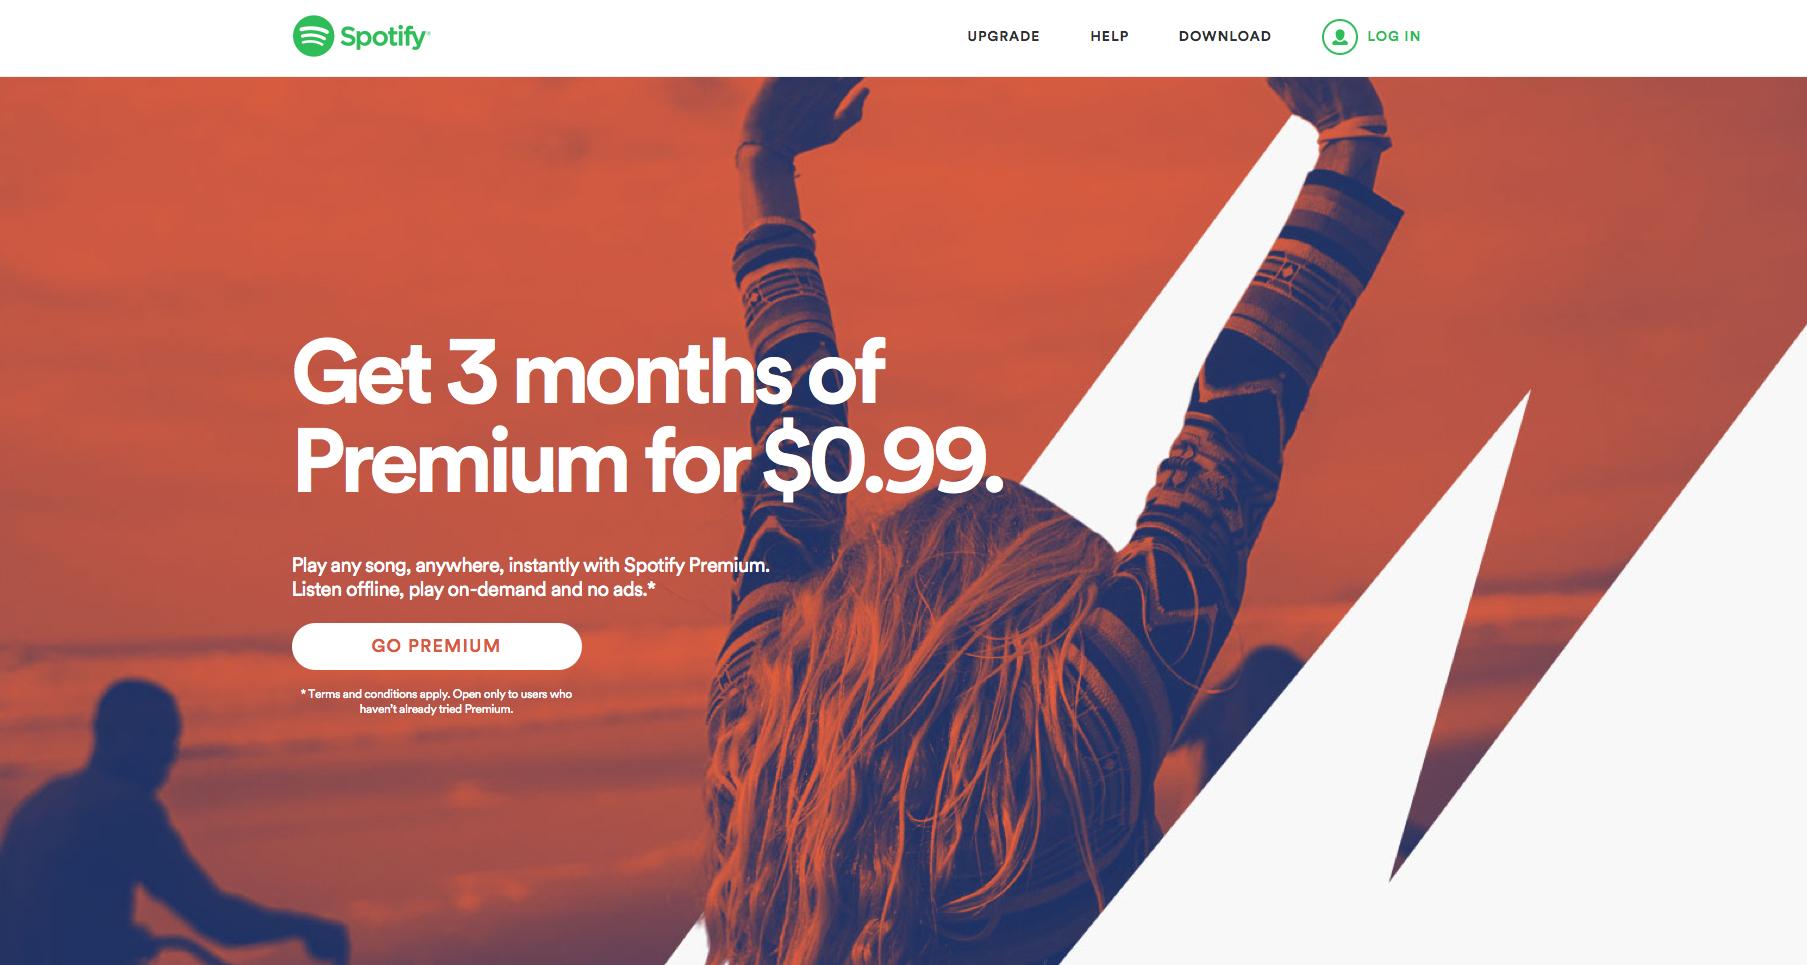 Spotify Premium Ads